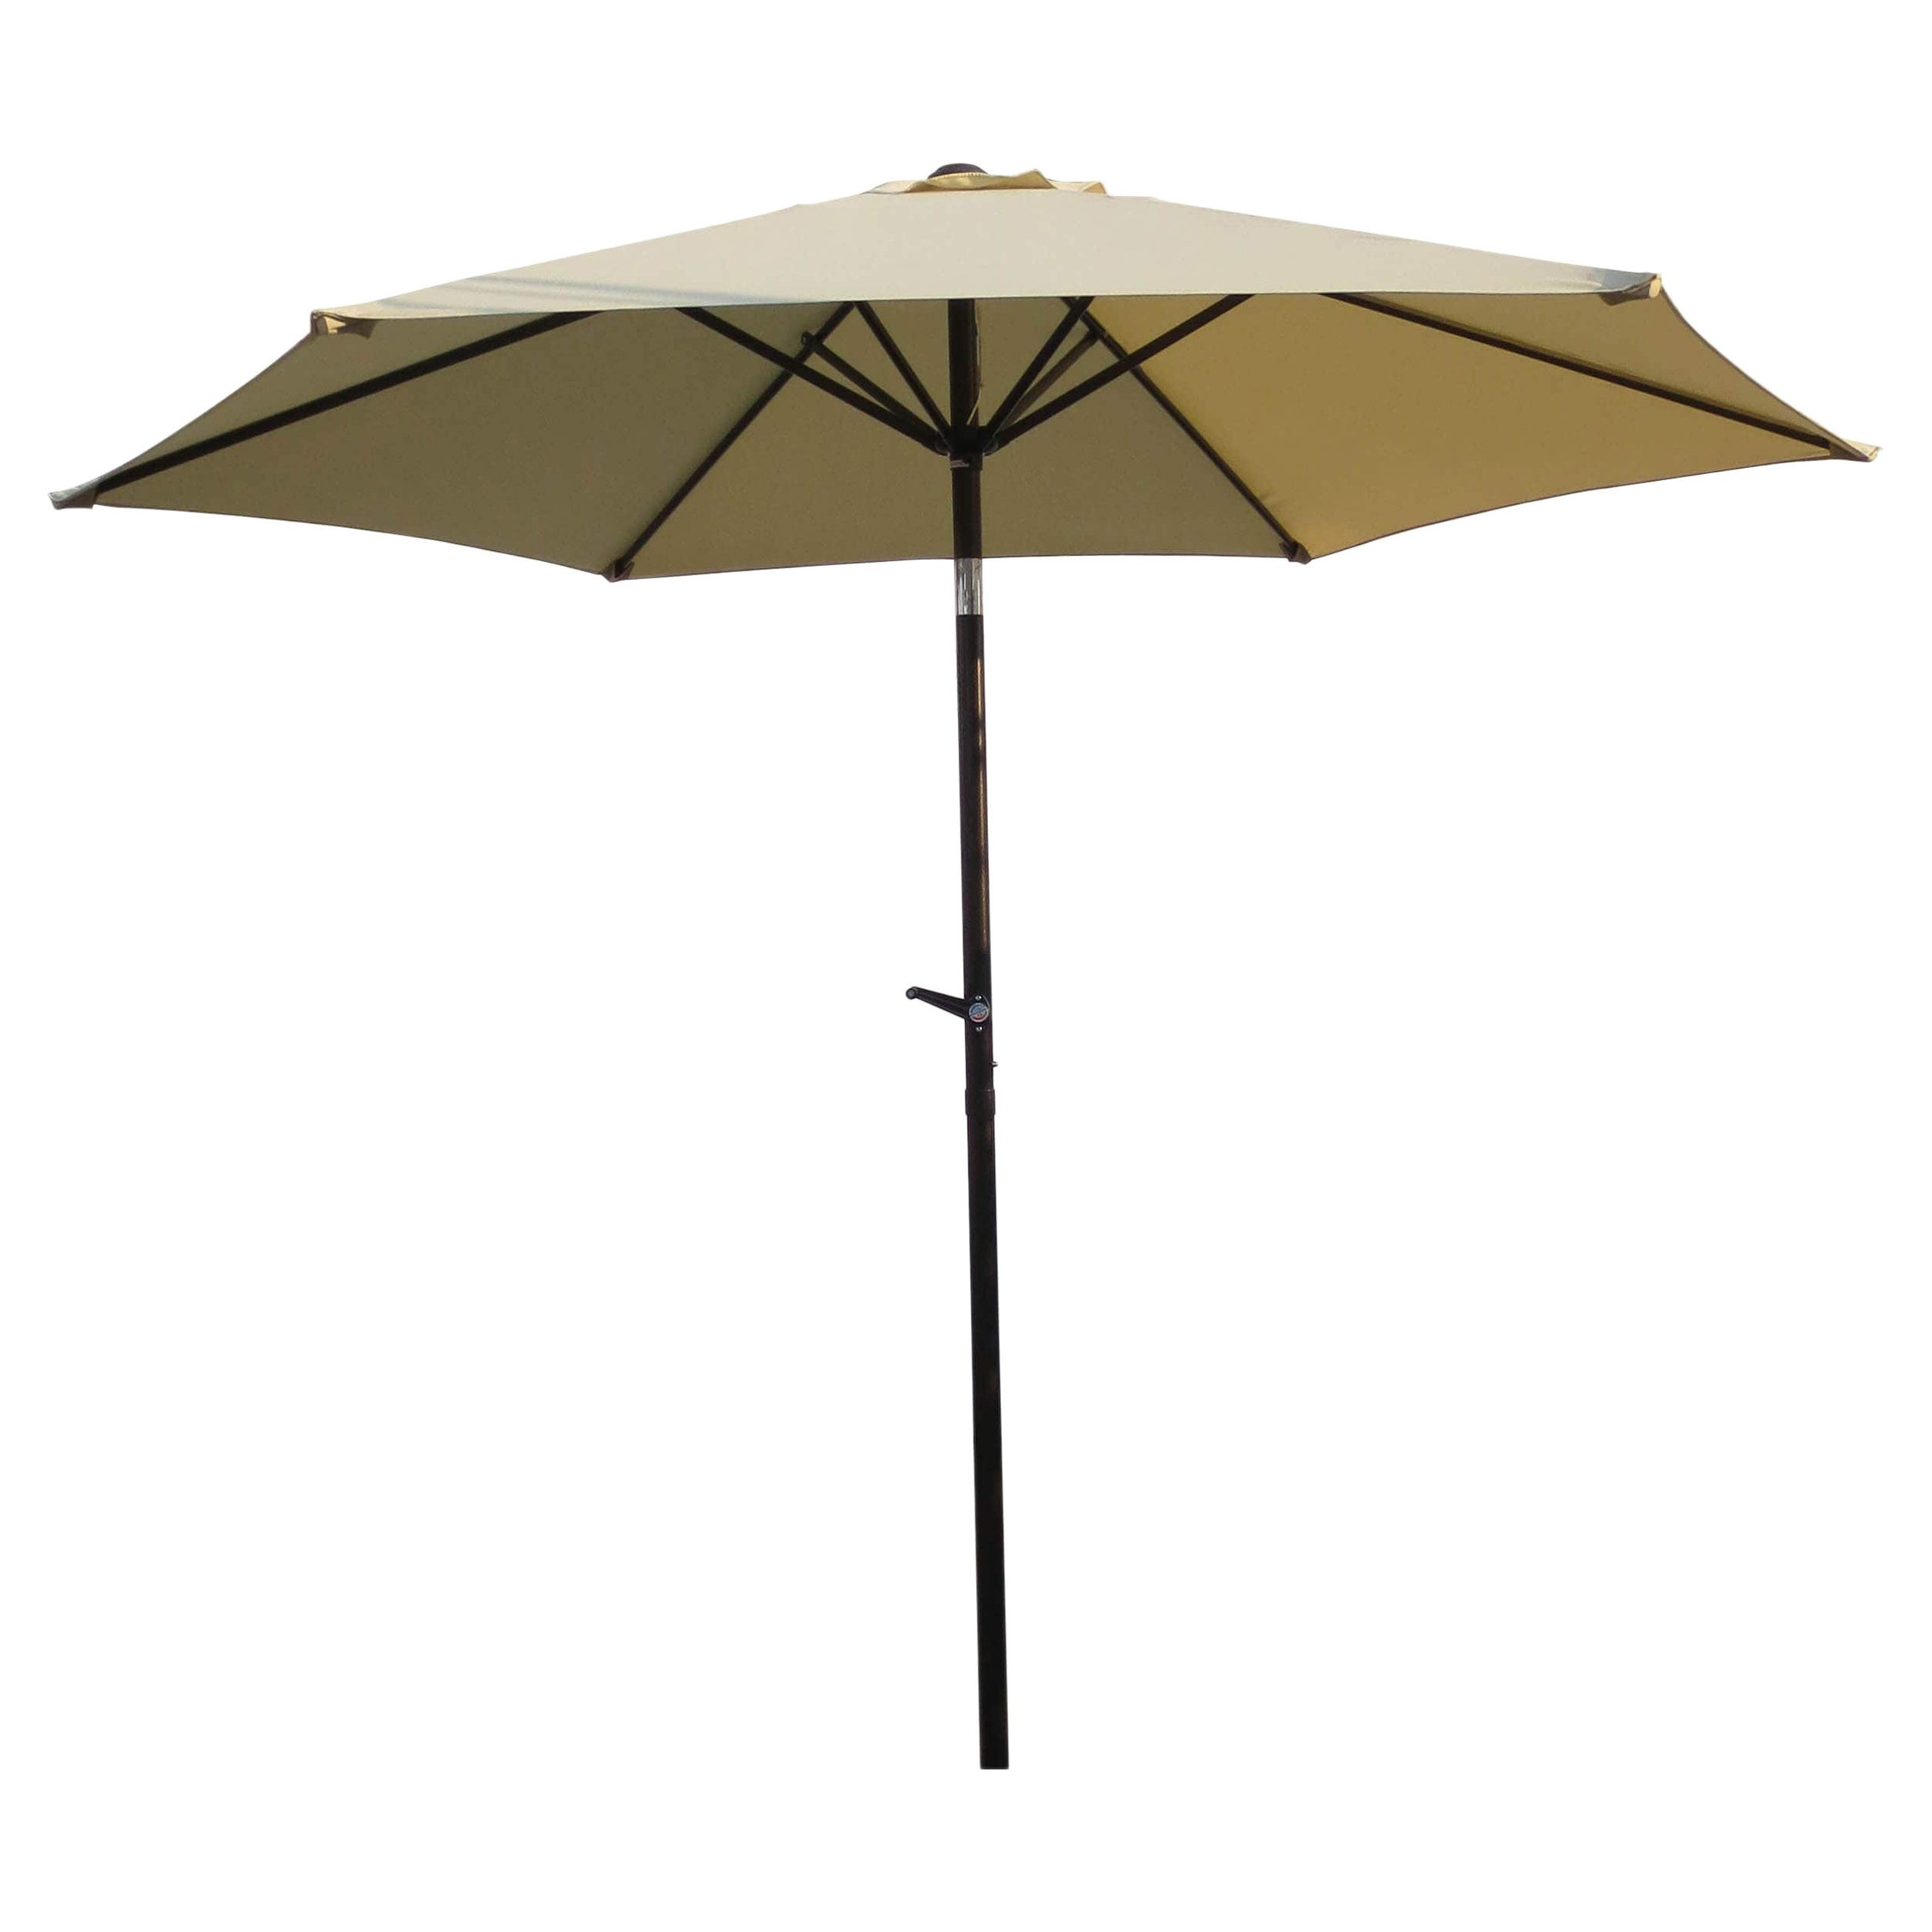 2019 Frome Market Umbrellas In Patio Umbrella 8 Foot (View 20 of 20)